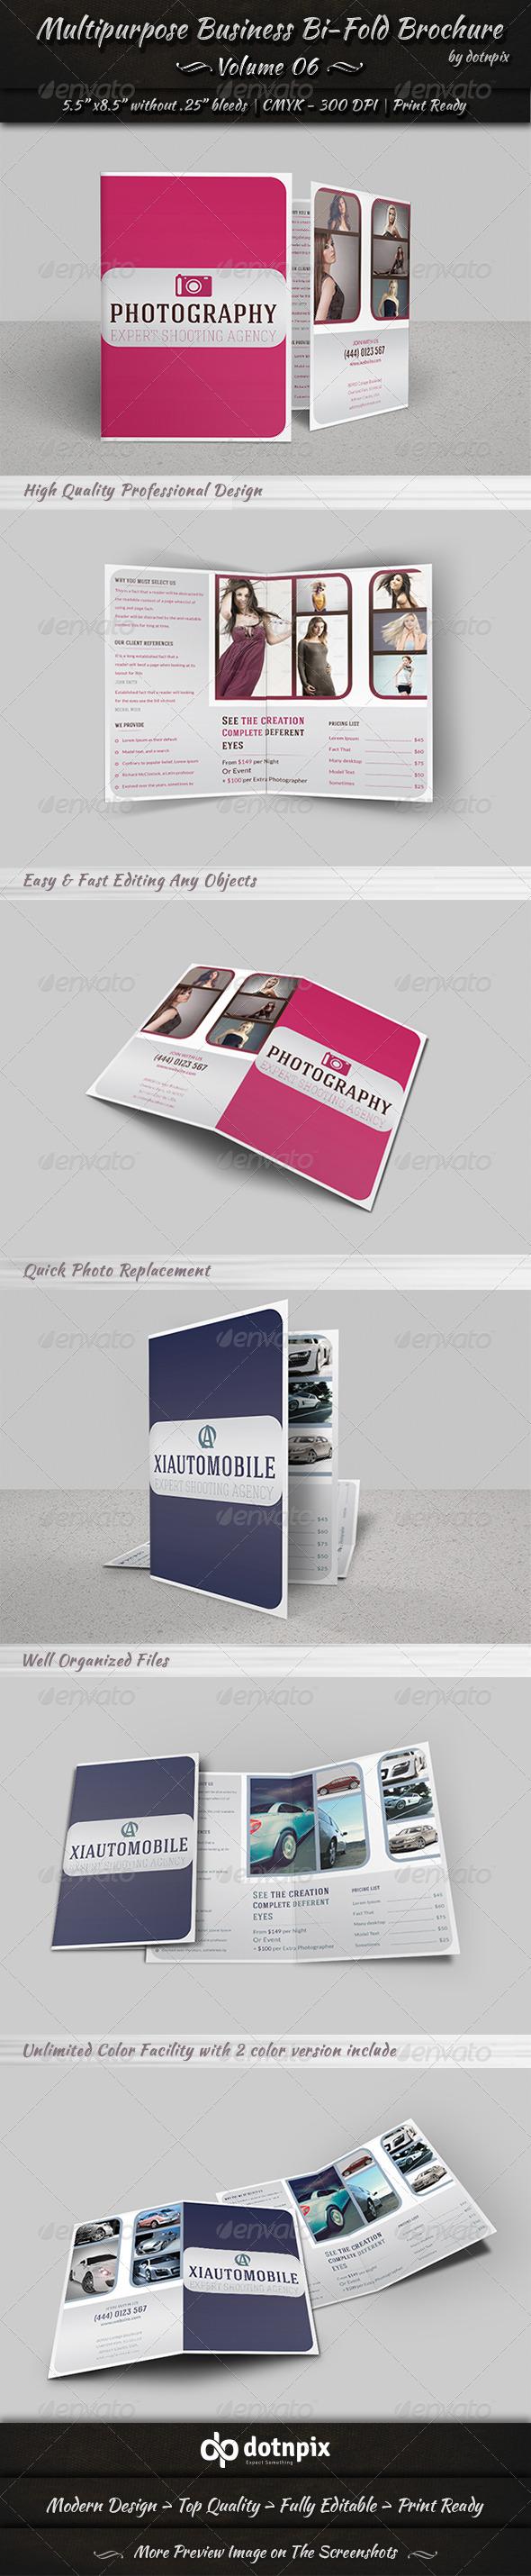 GraphicRiver Multipurpose Business Bi-Fold Brochure Volume 6 7860425